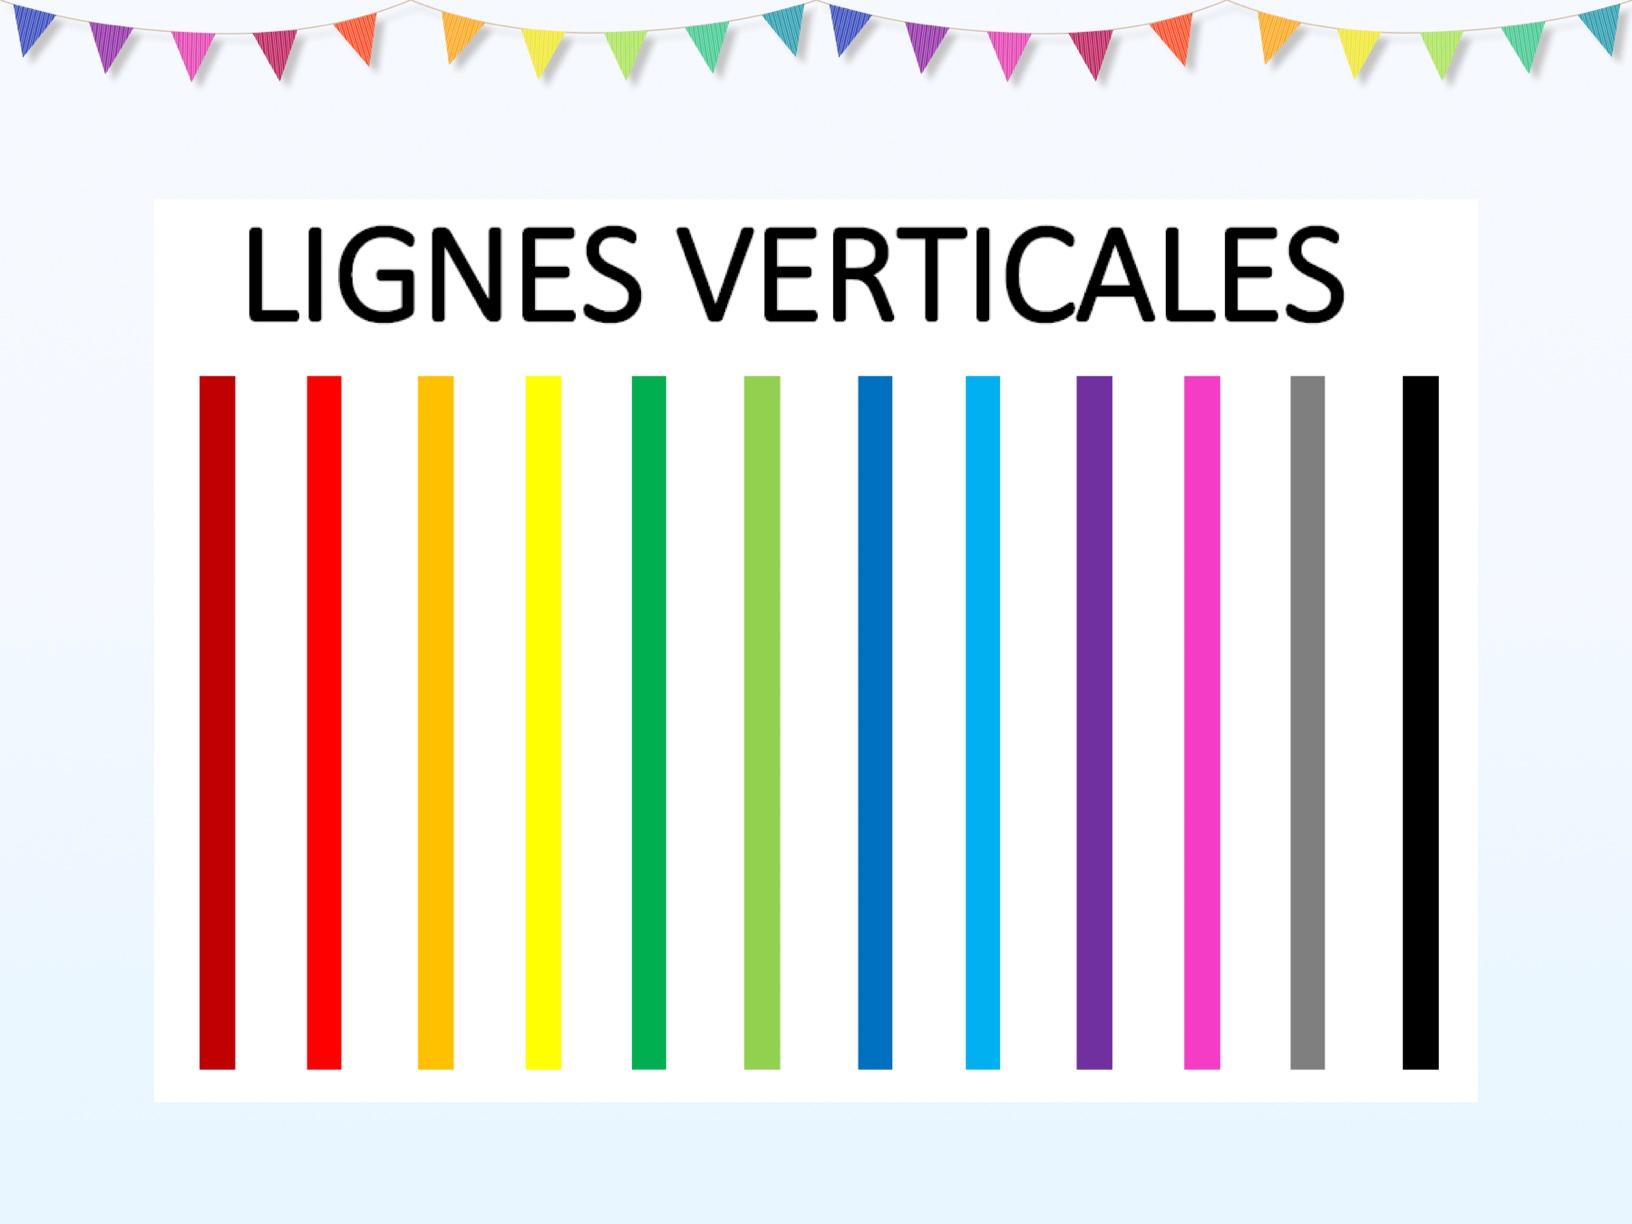 Lignes verticales